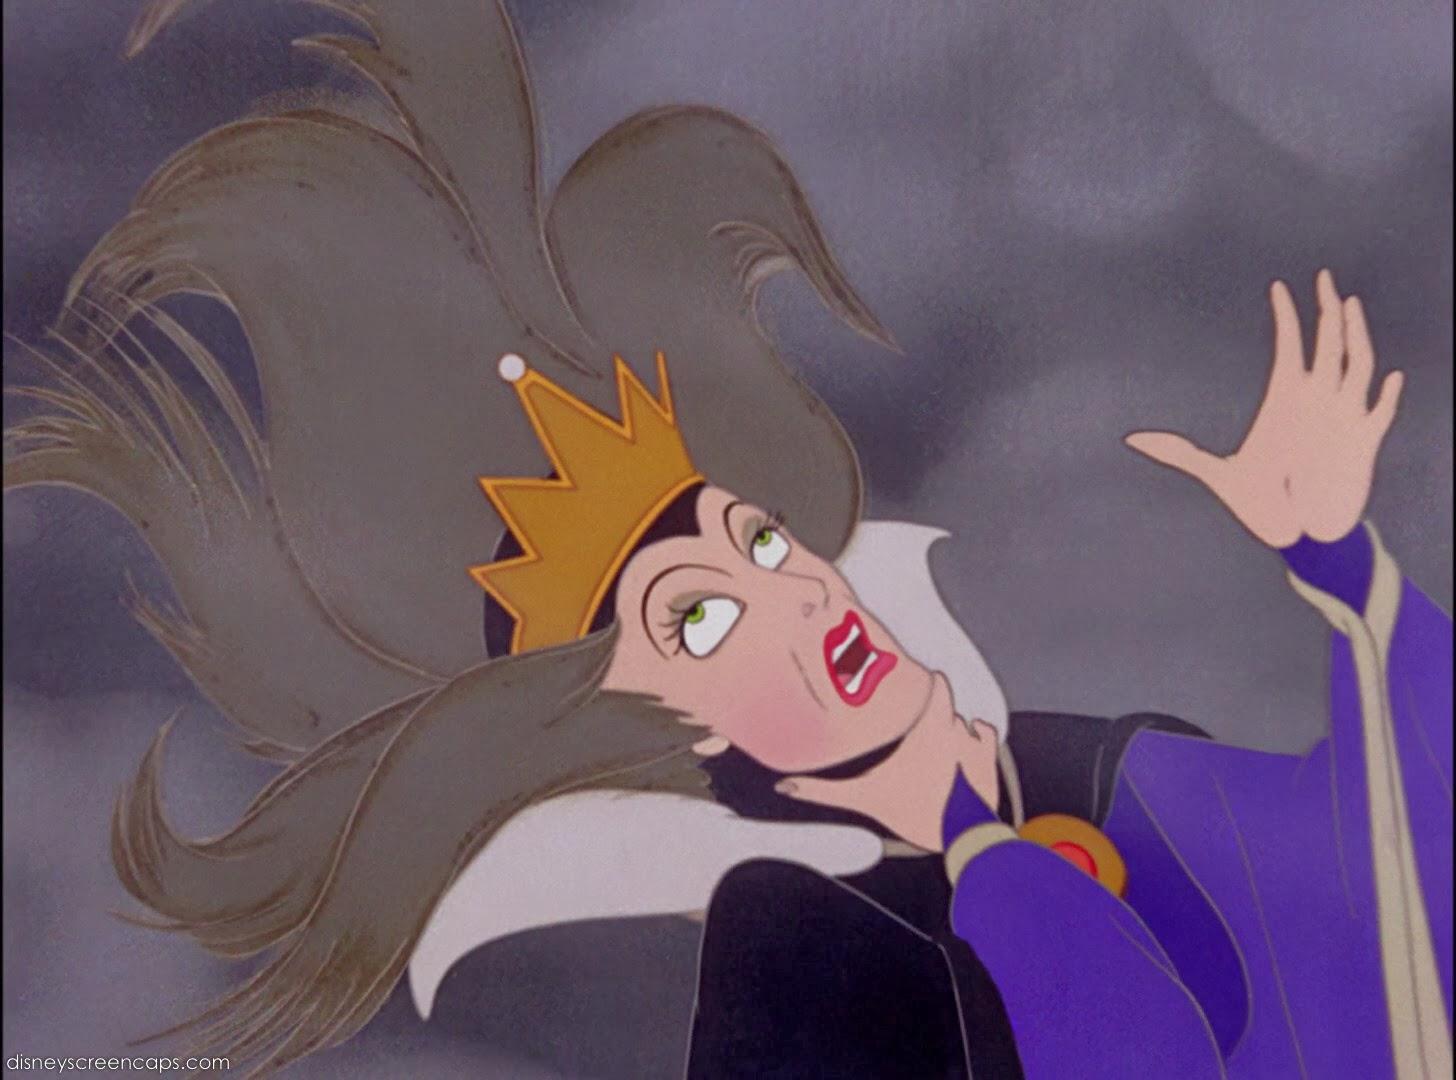 Prince fights enchantress to save princess.